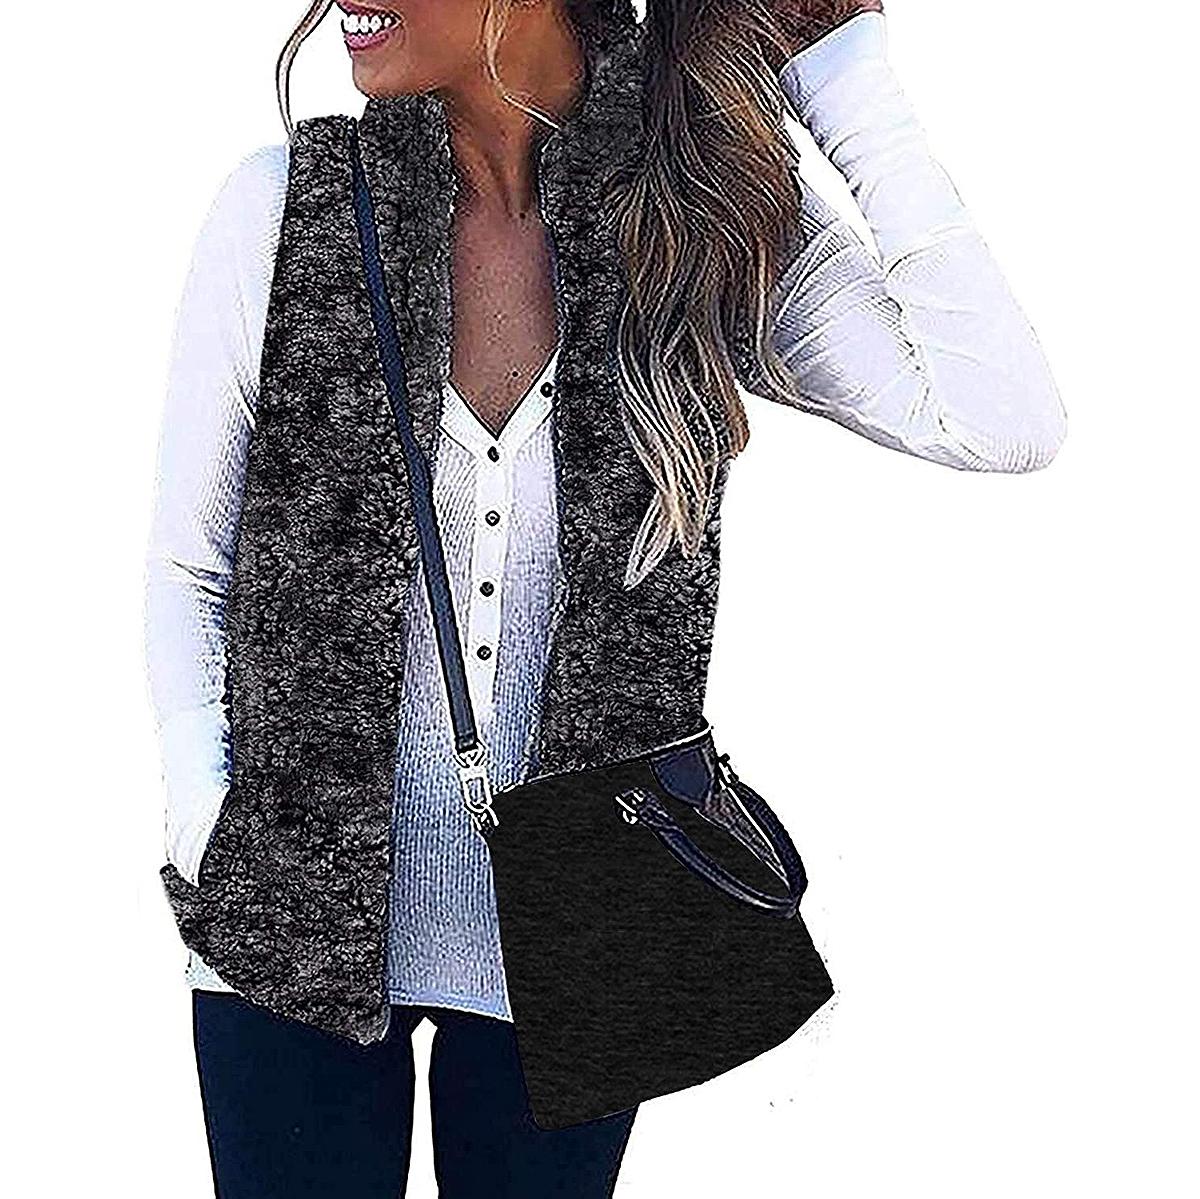 ZESICA Sleeveless Zip Up Fuzzy Fleece Fall Zipper Vest